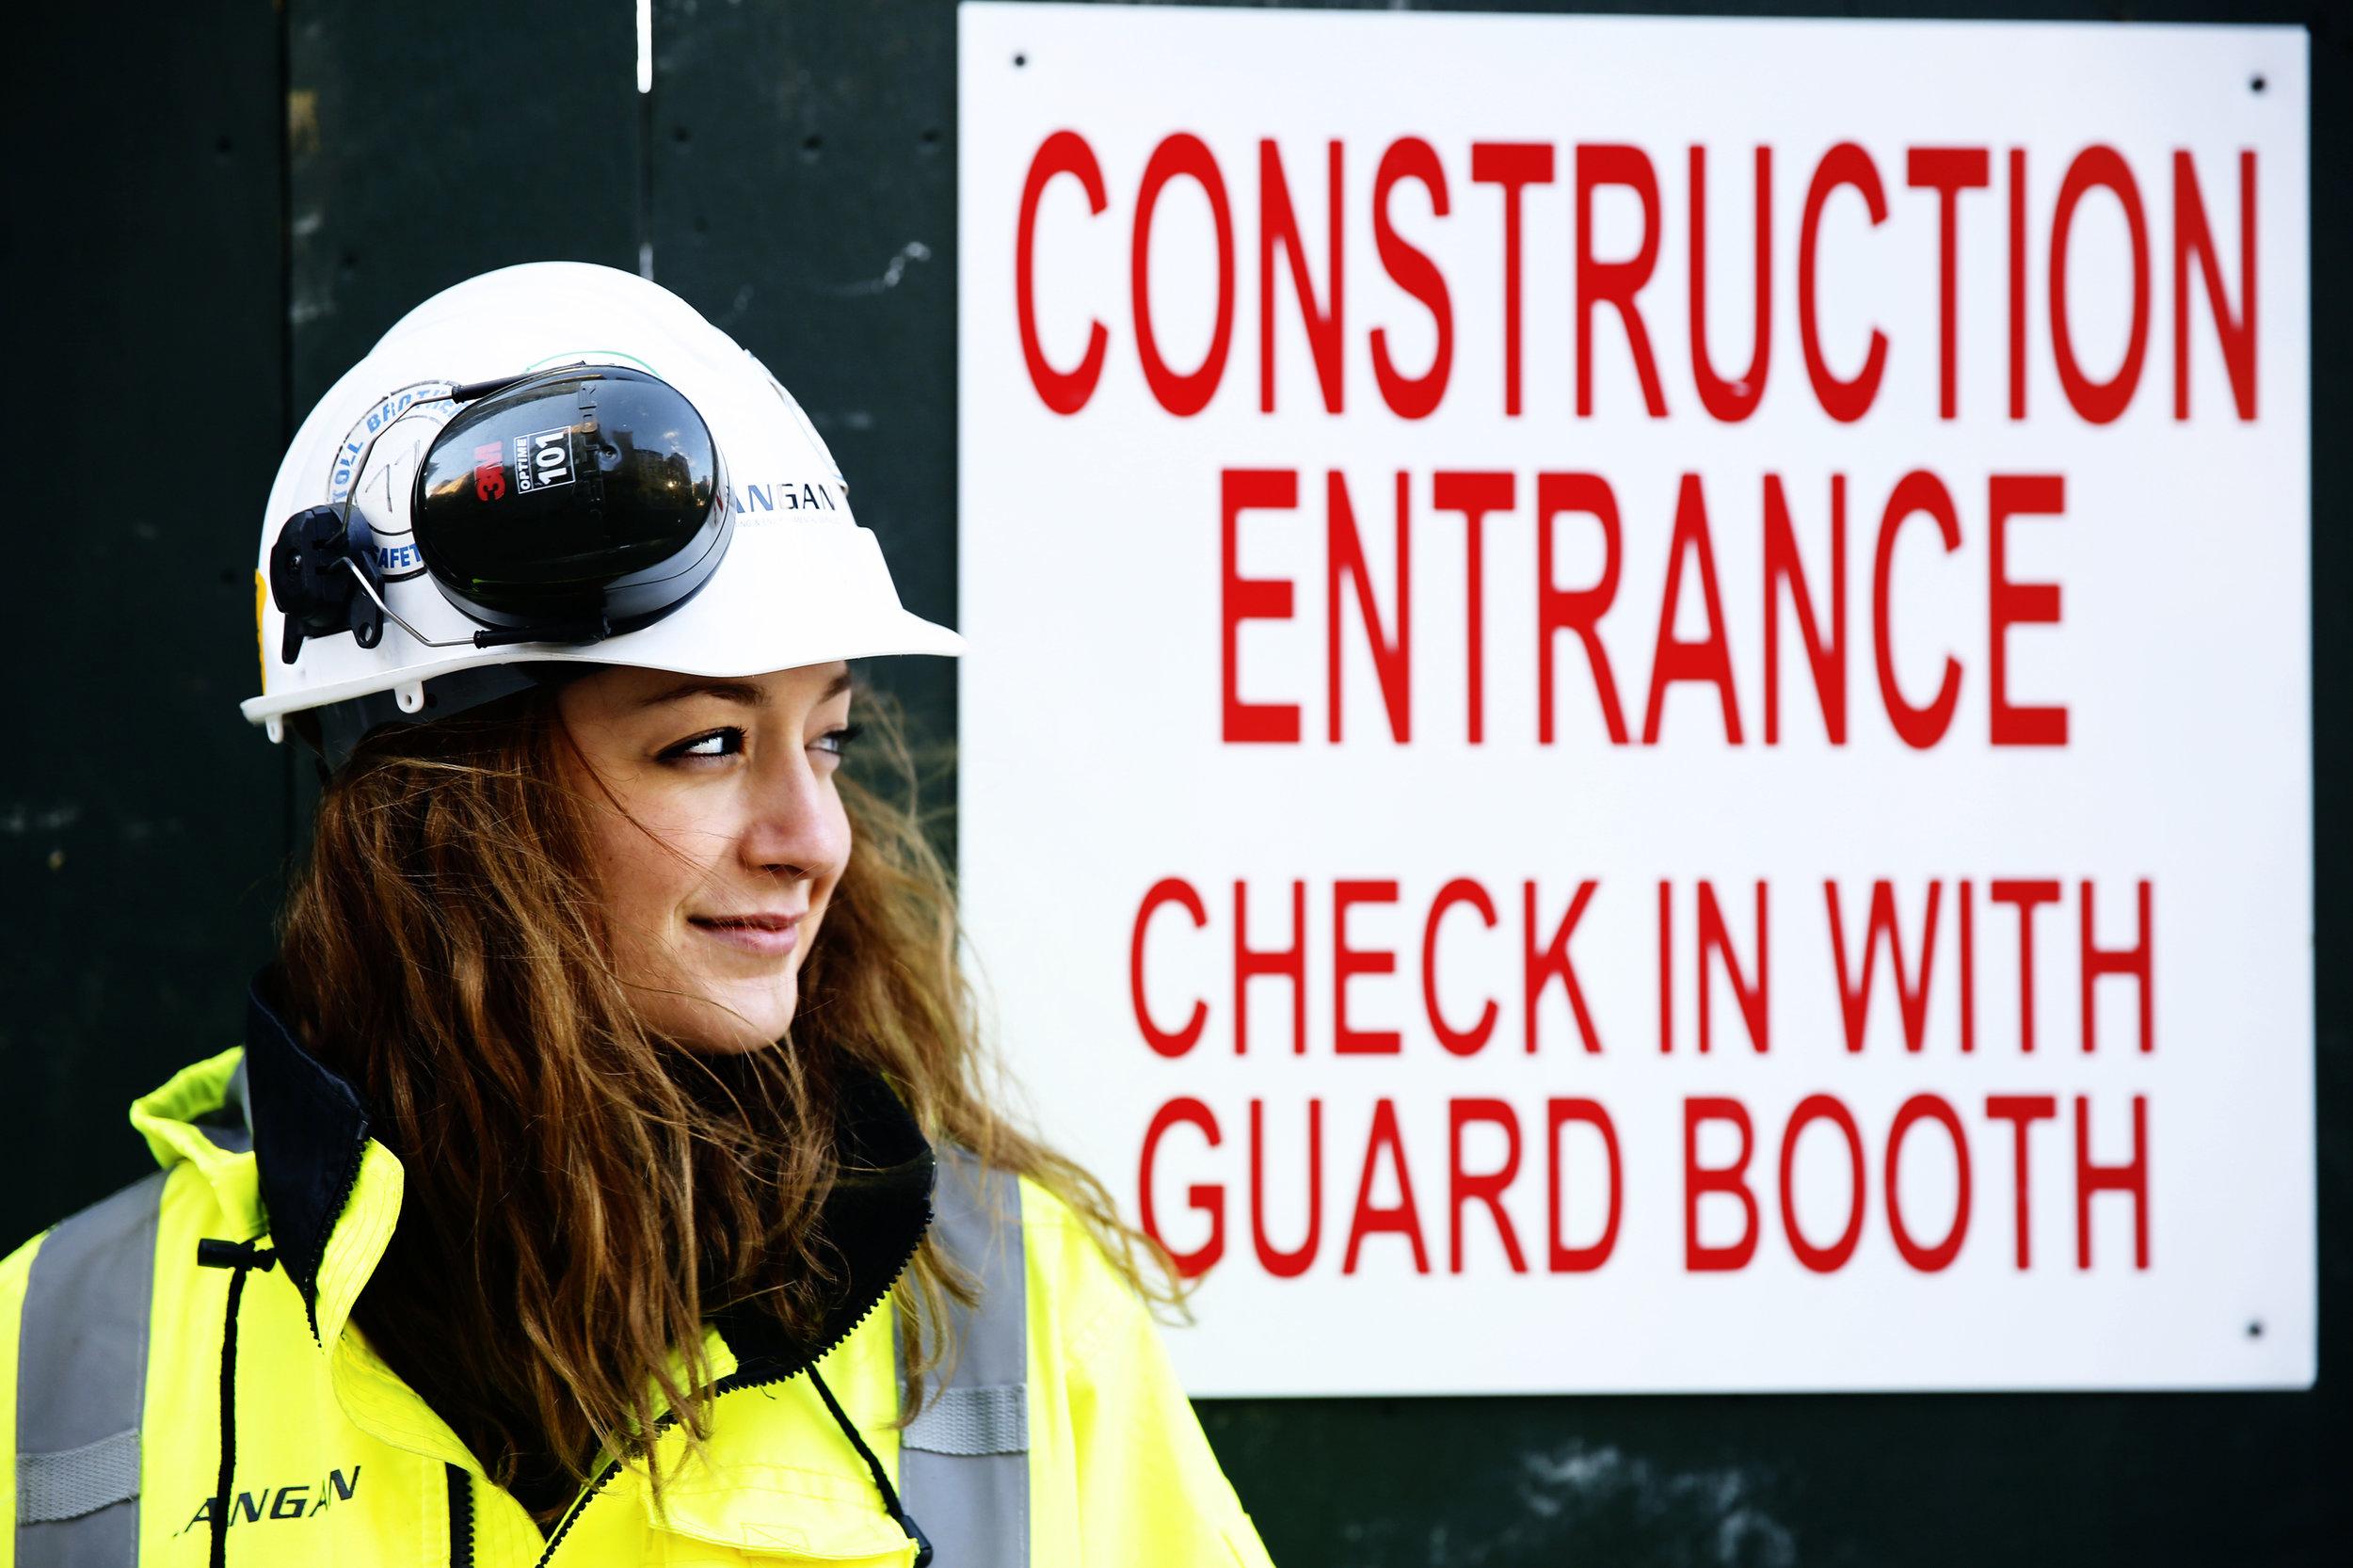 Environmental Engineer, New York City